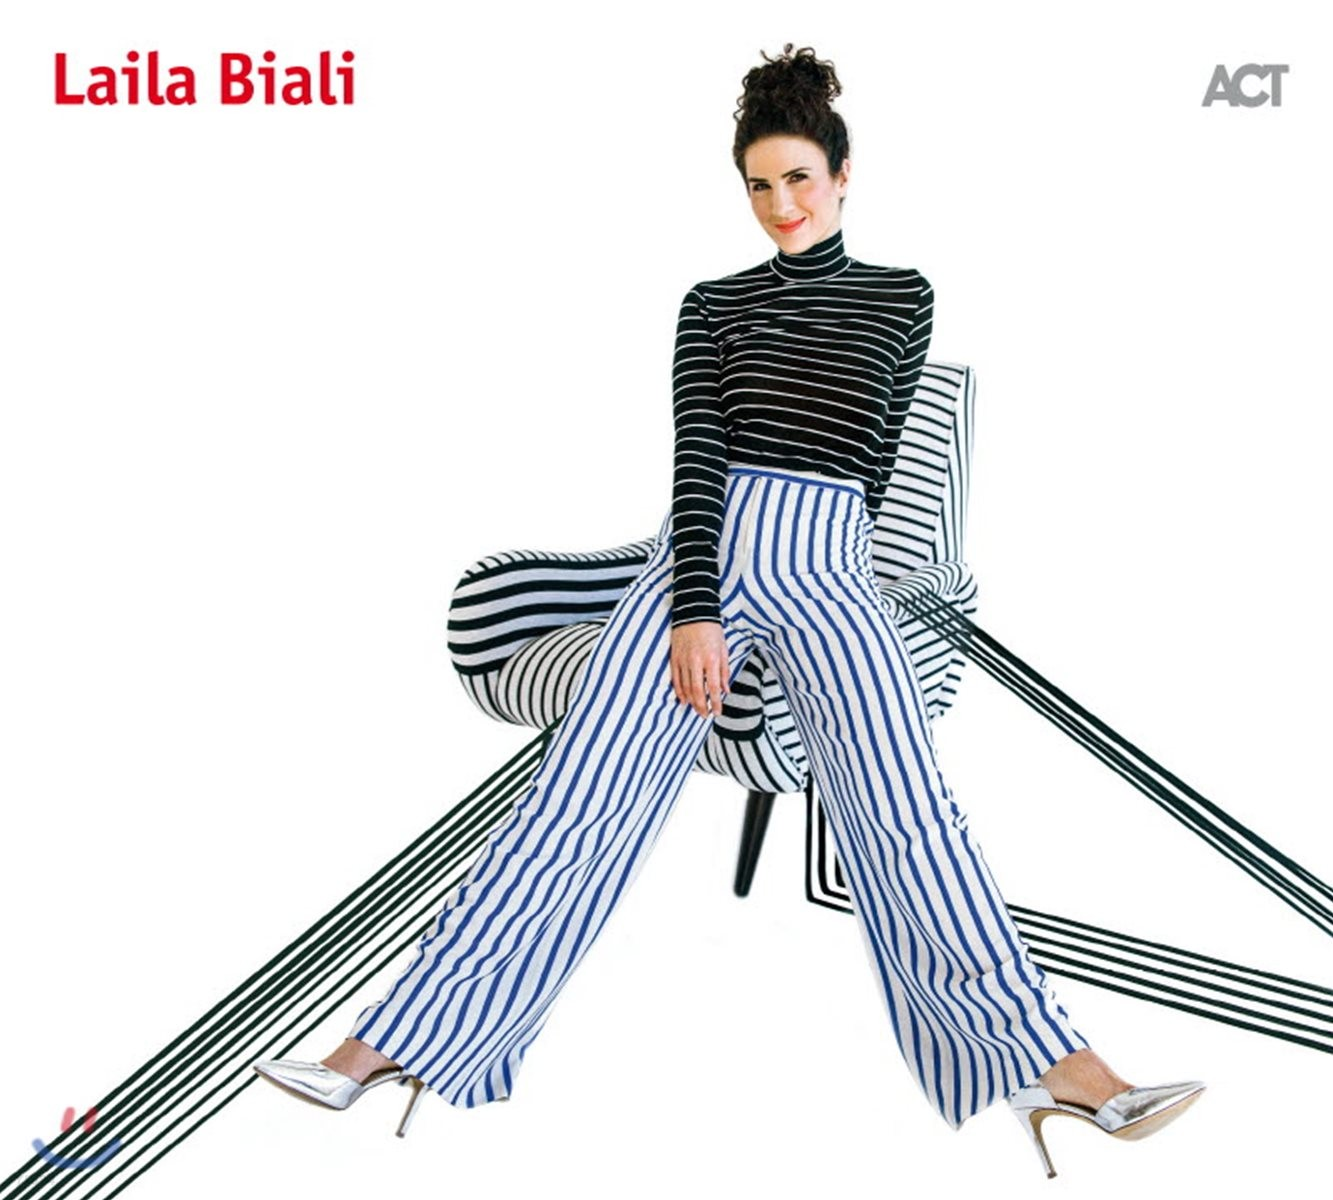 Laila Biali (레일라 비알리) - Laila Biali